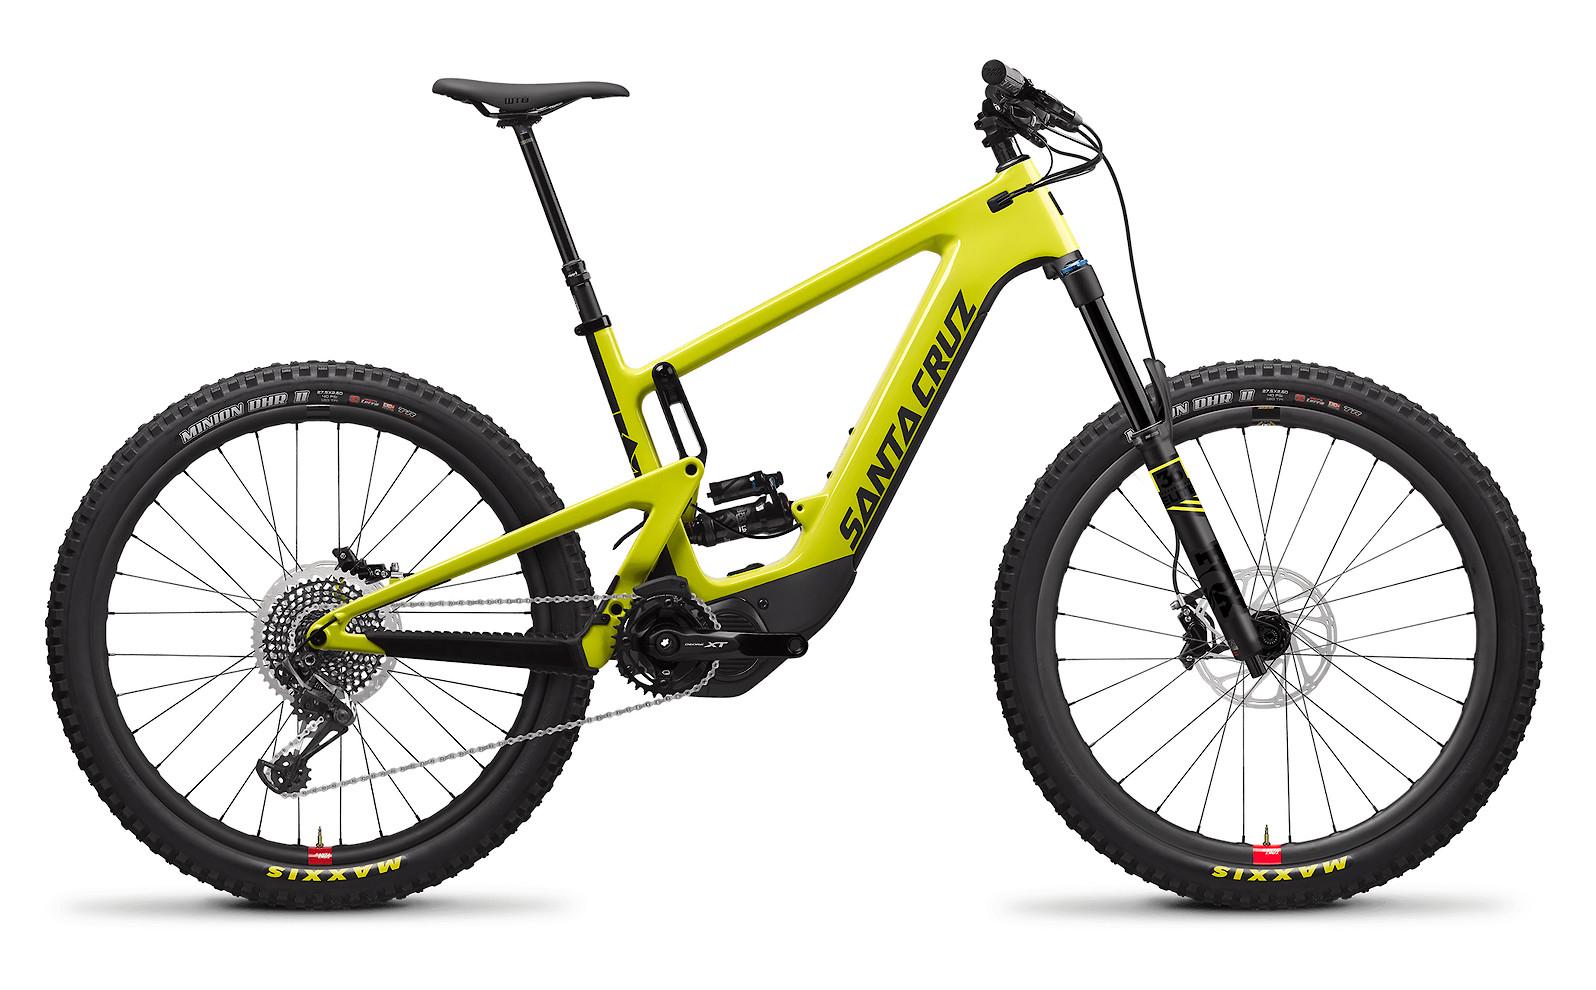 2020 Santa Cruz Heckler Carbon CC X01 RSV (Yellowjacket and Black)